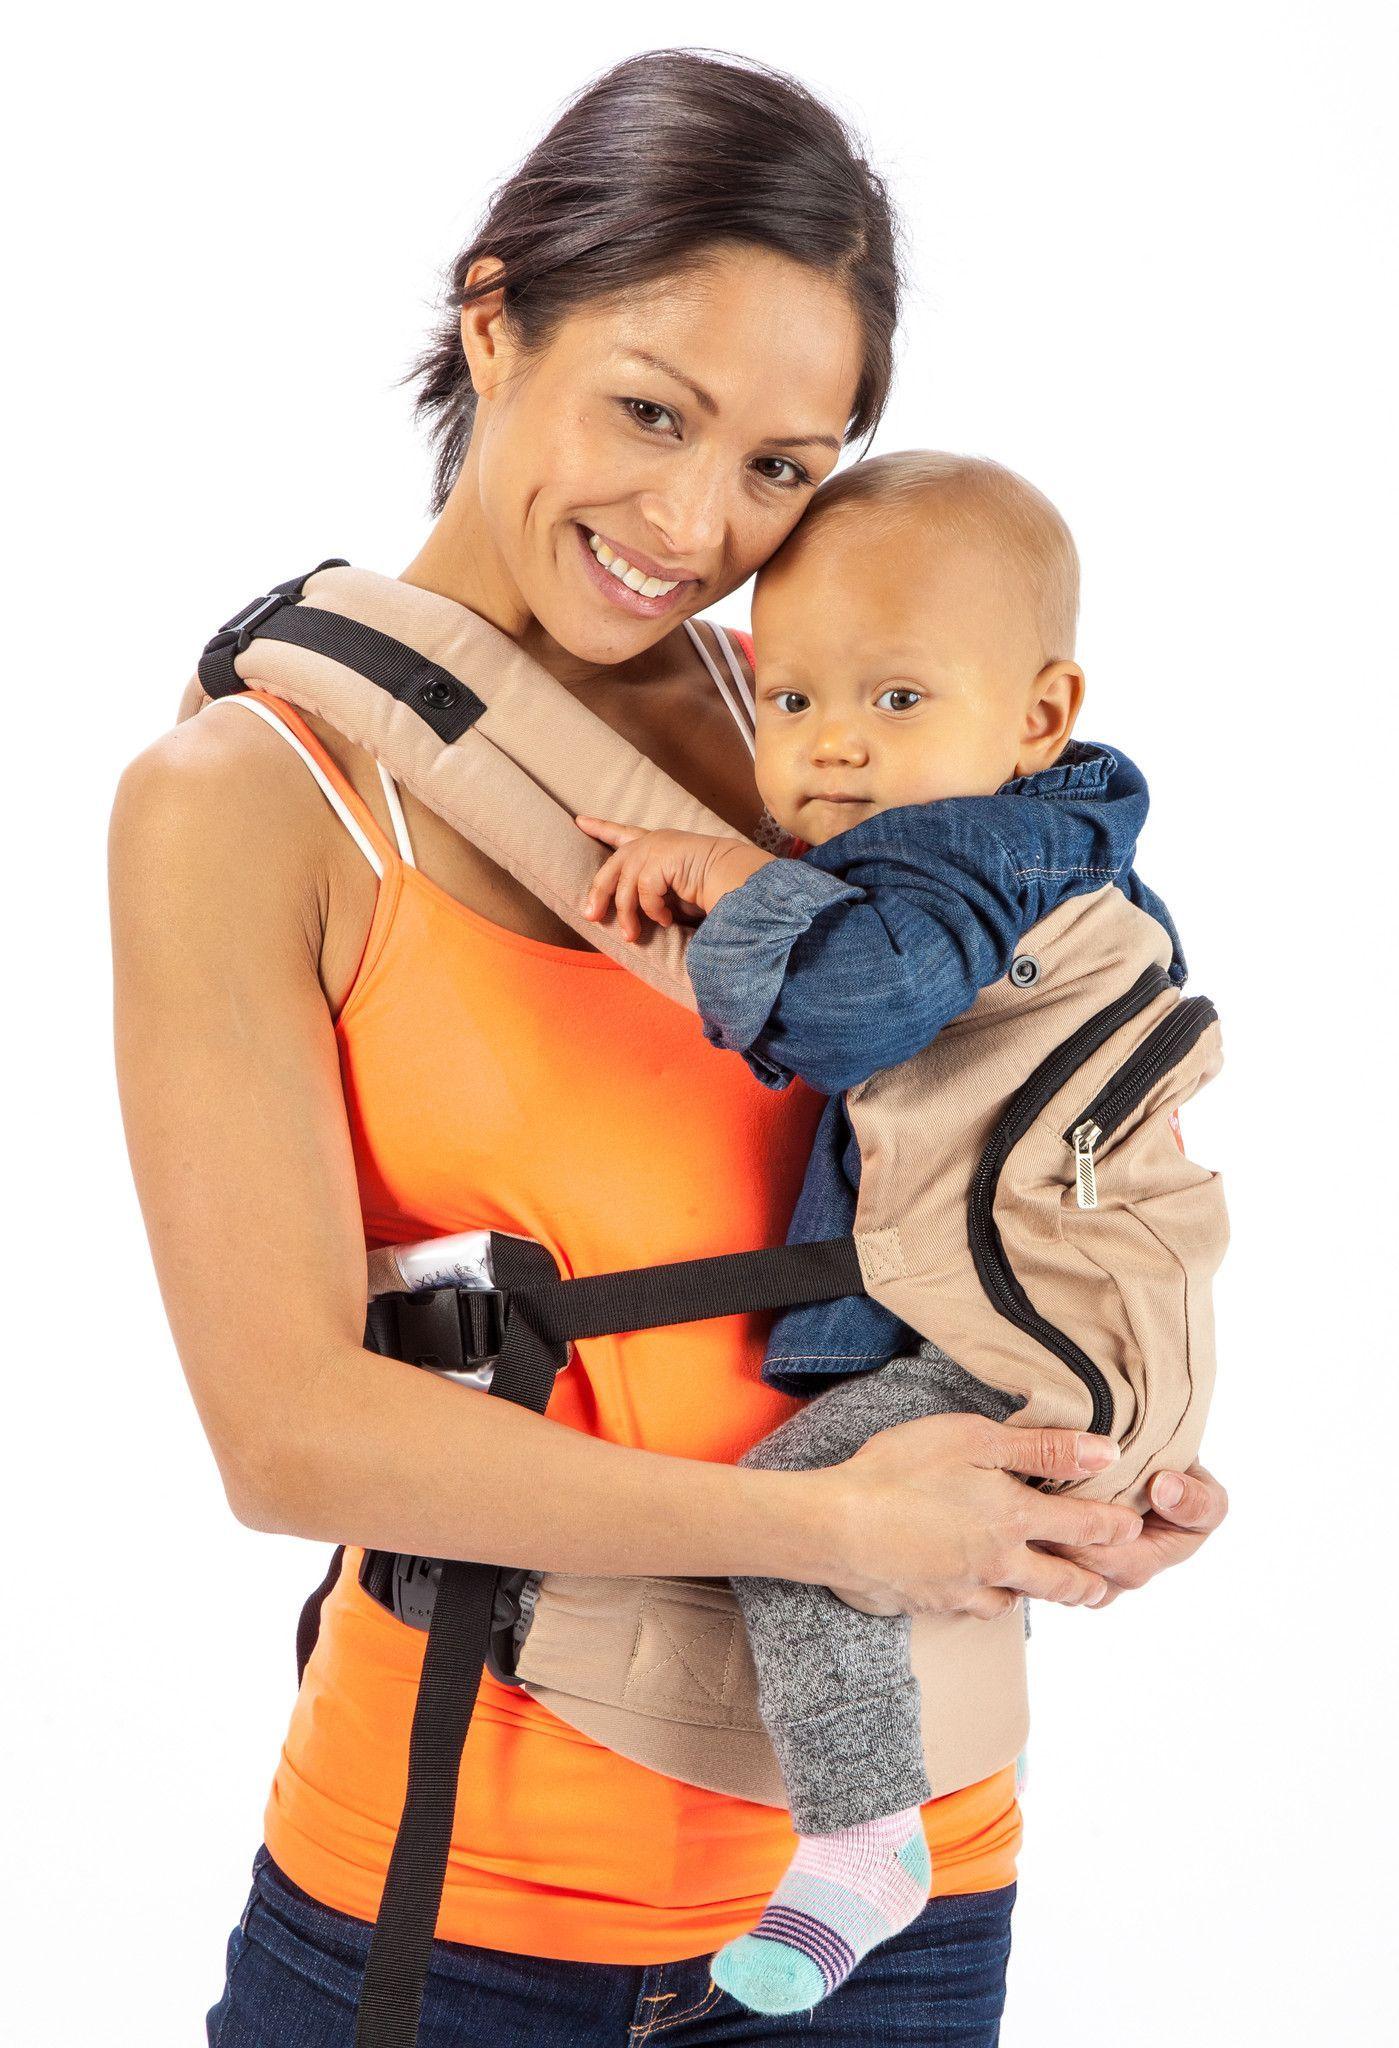 Mo+m® Ergonomic Baby Sling Carrier w/ Mesh Cooling Vent, Hood & Pockets